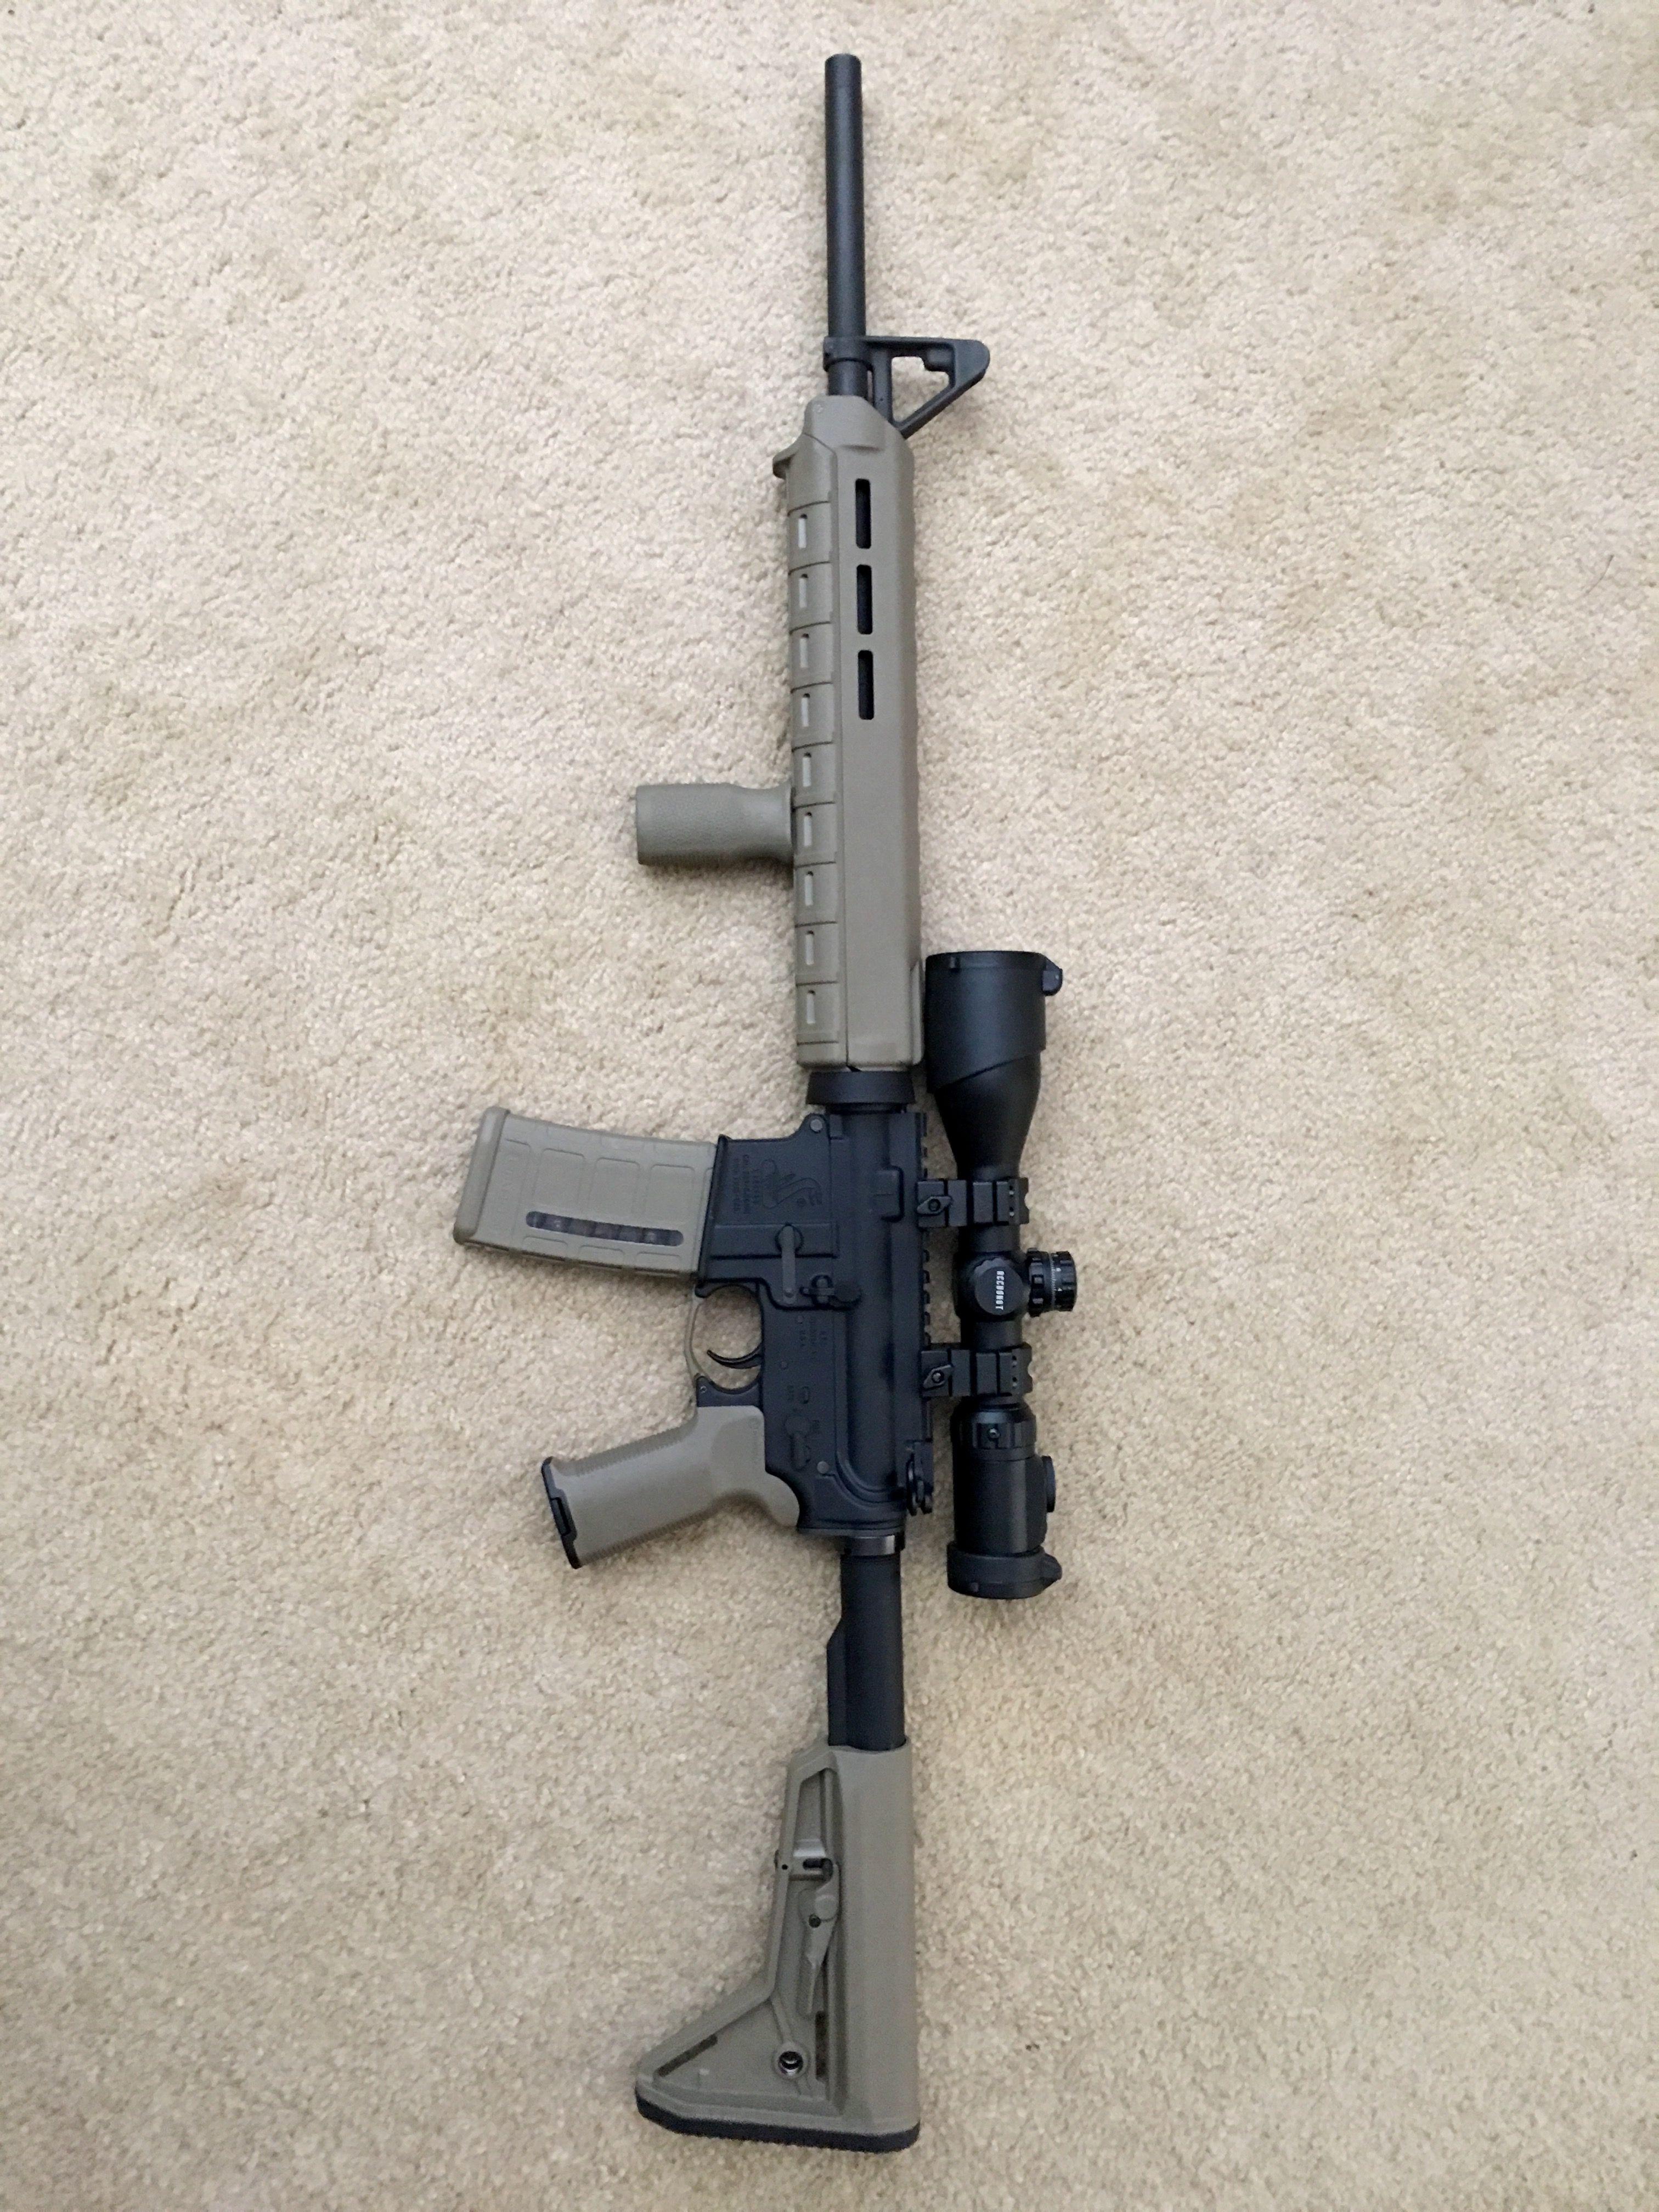 Pin by RAE Industries on bushmaster | Bushmaster ar, Guns, Guns, ammo